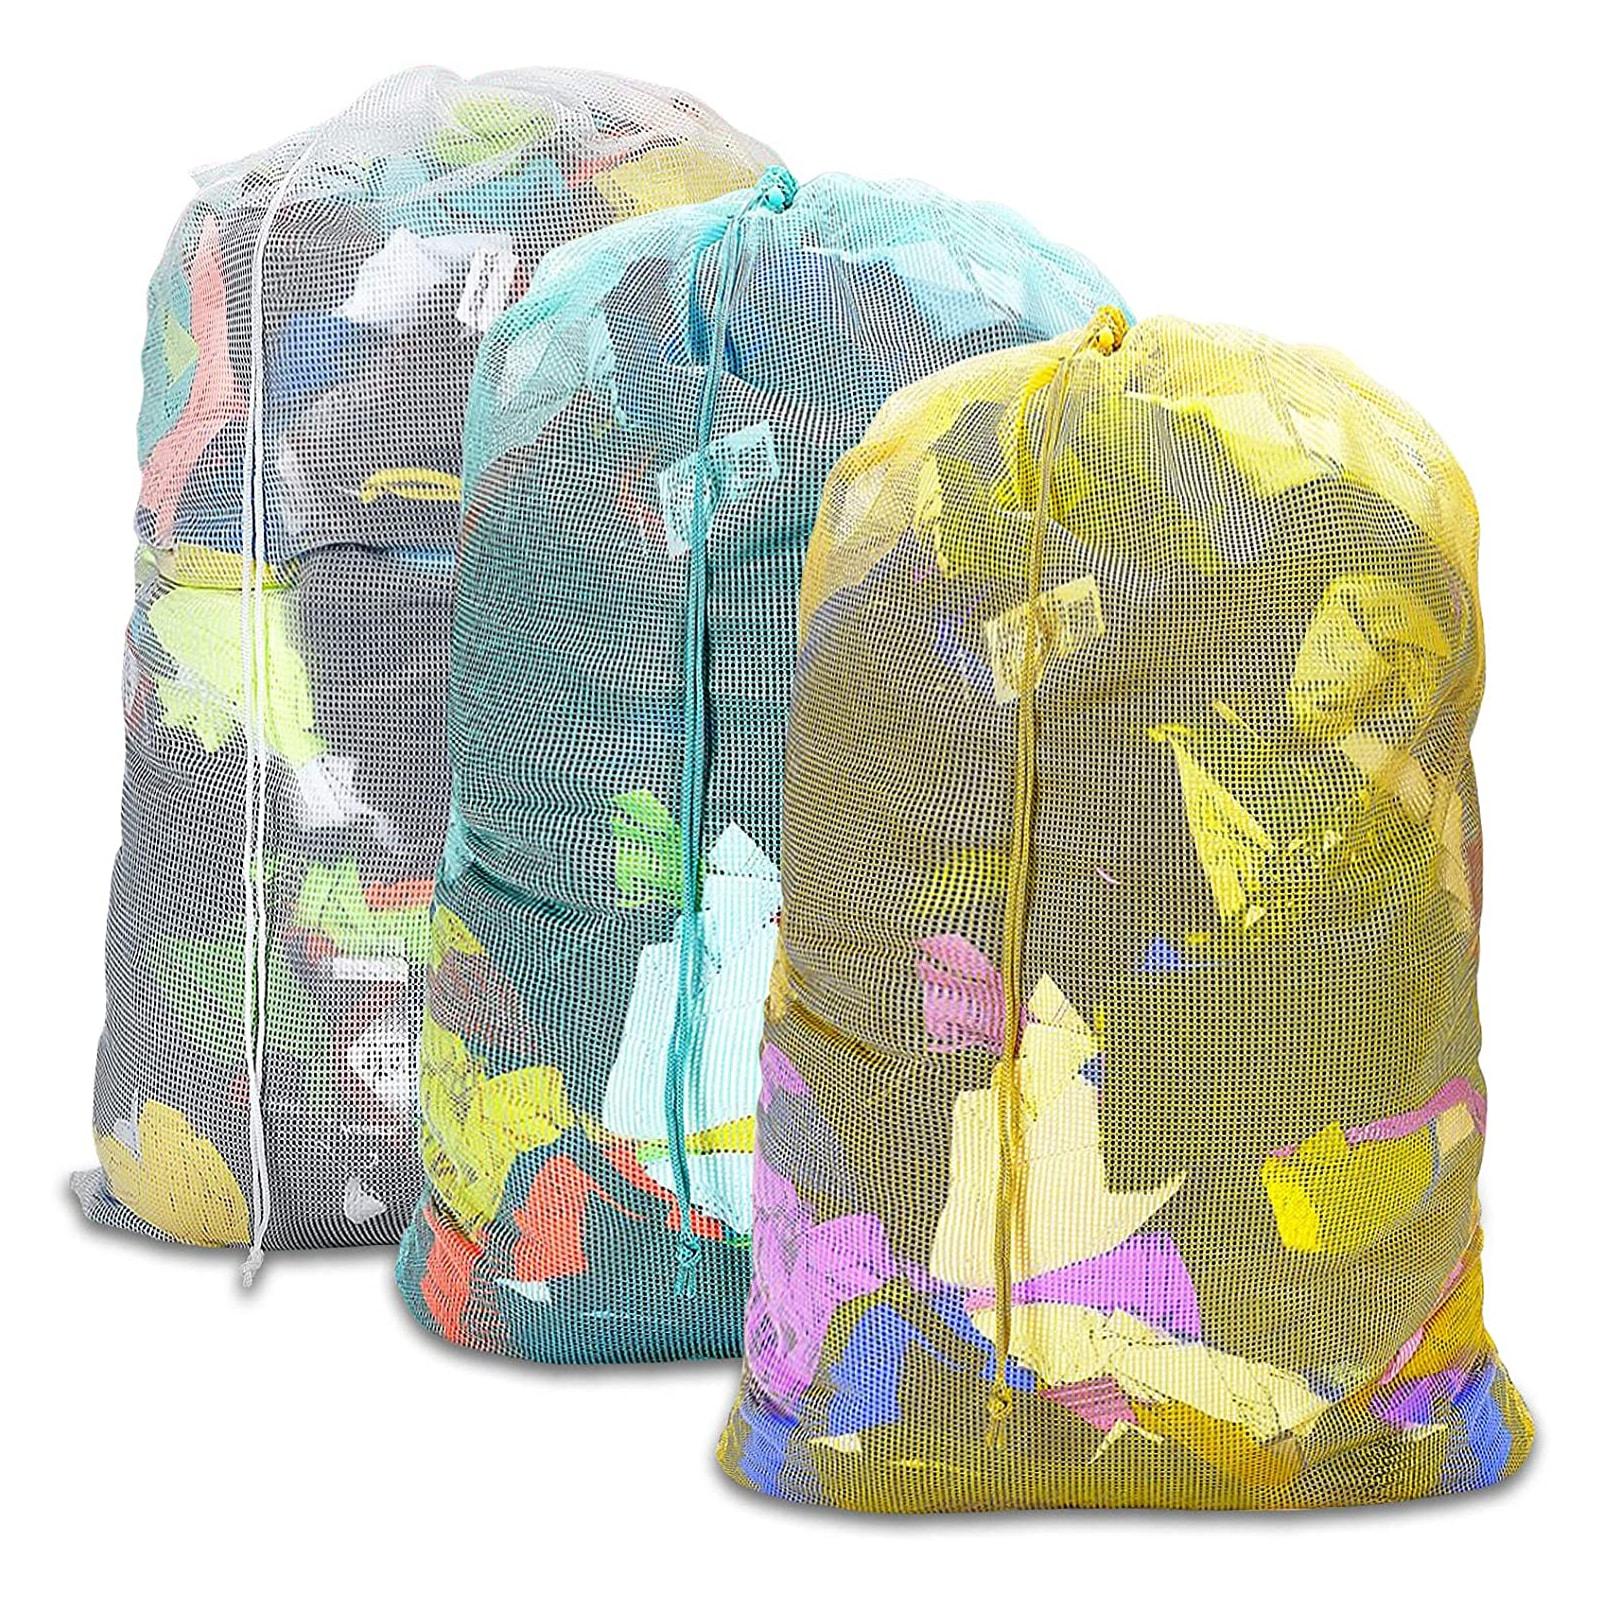 Daly Kate Mesh Laundry Bag